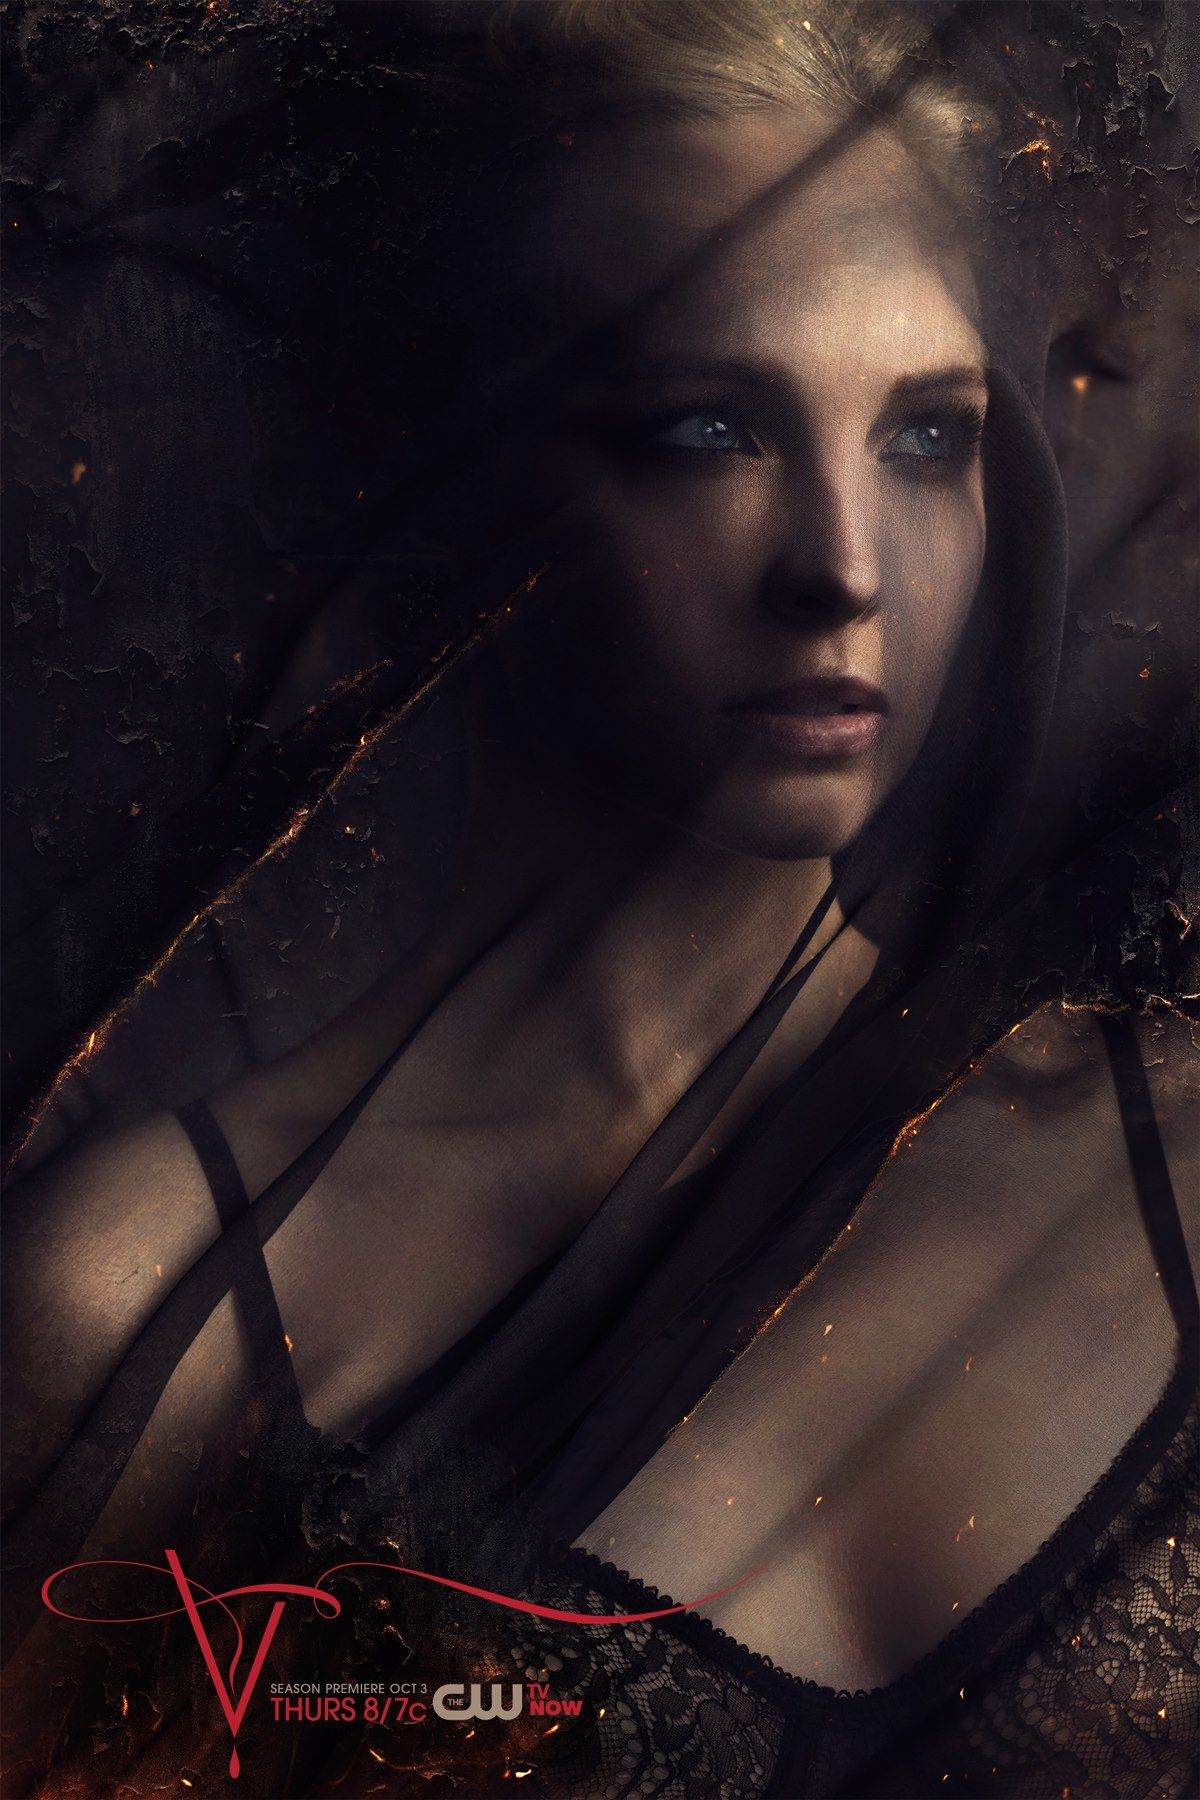 Candice Accola As Caroline Vampire Diaries Season 5 Vampire Diaries Seasons Vampire Diaries